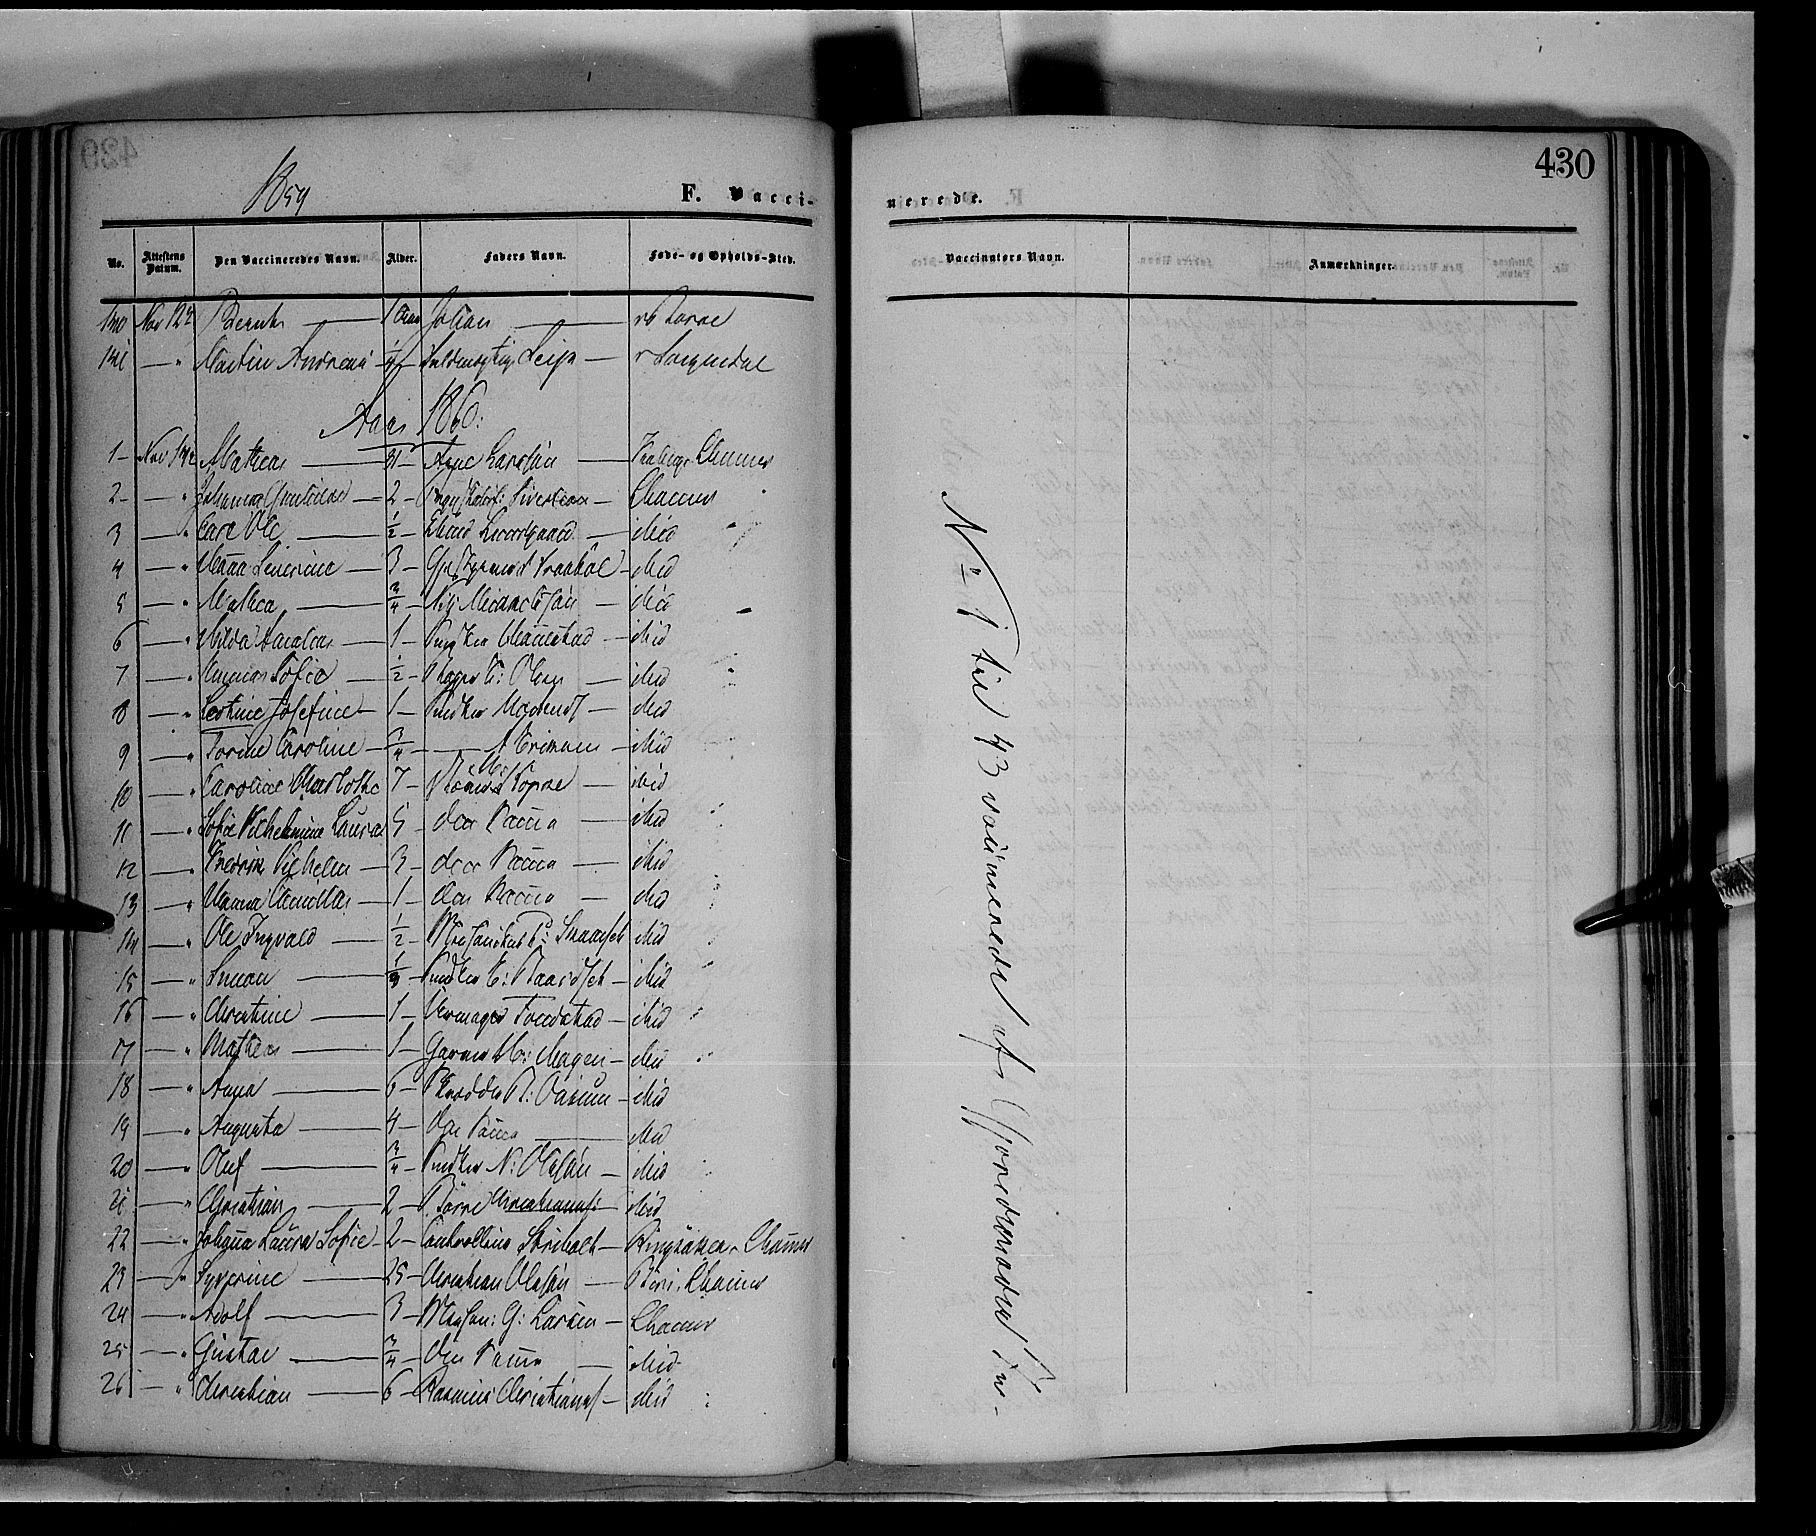 SAH, Fåberg prestekontor, Ministerialbok nr. 6B, 1855-1867, s. 430